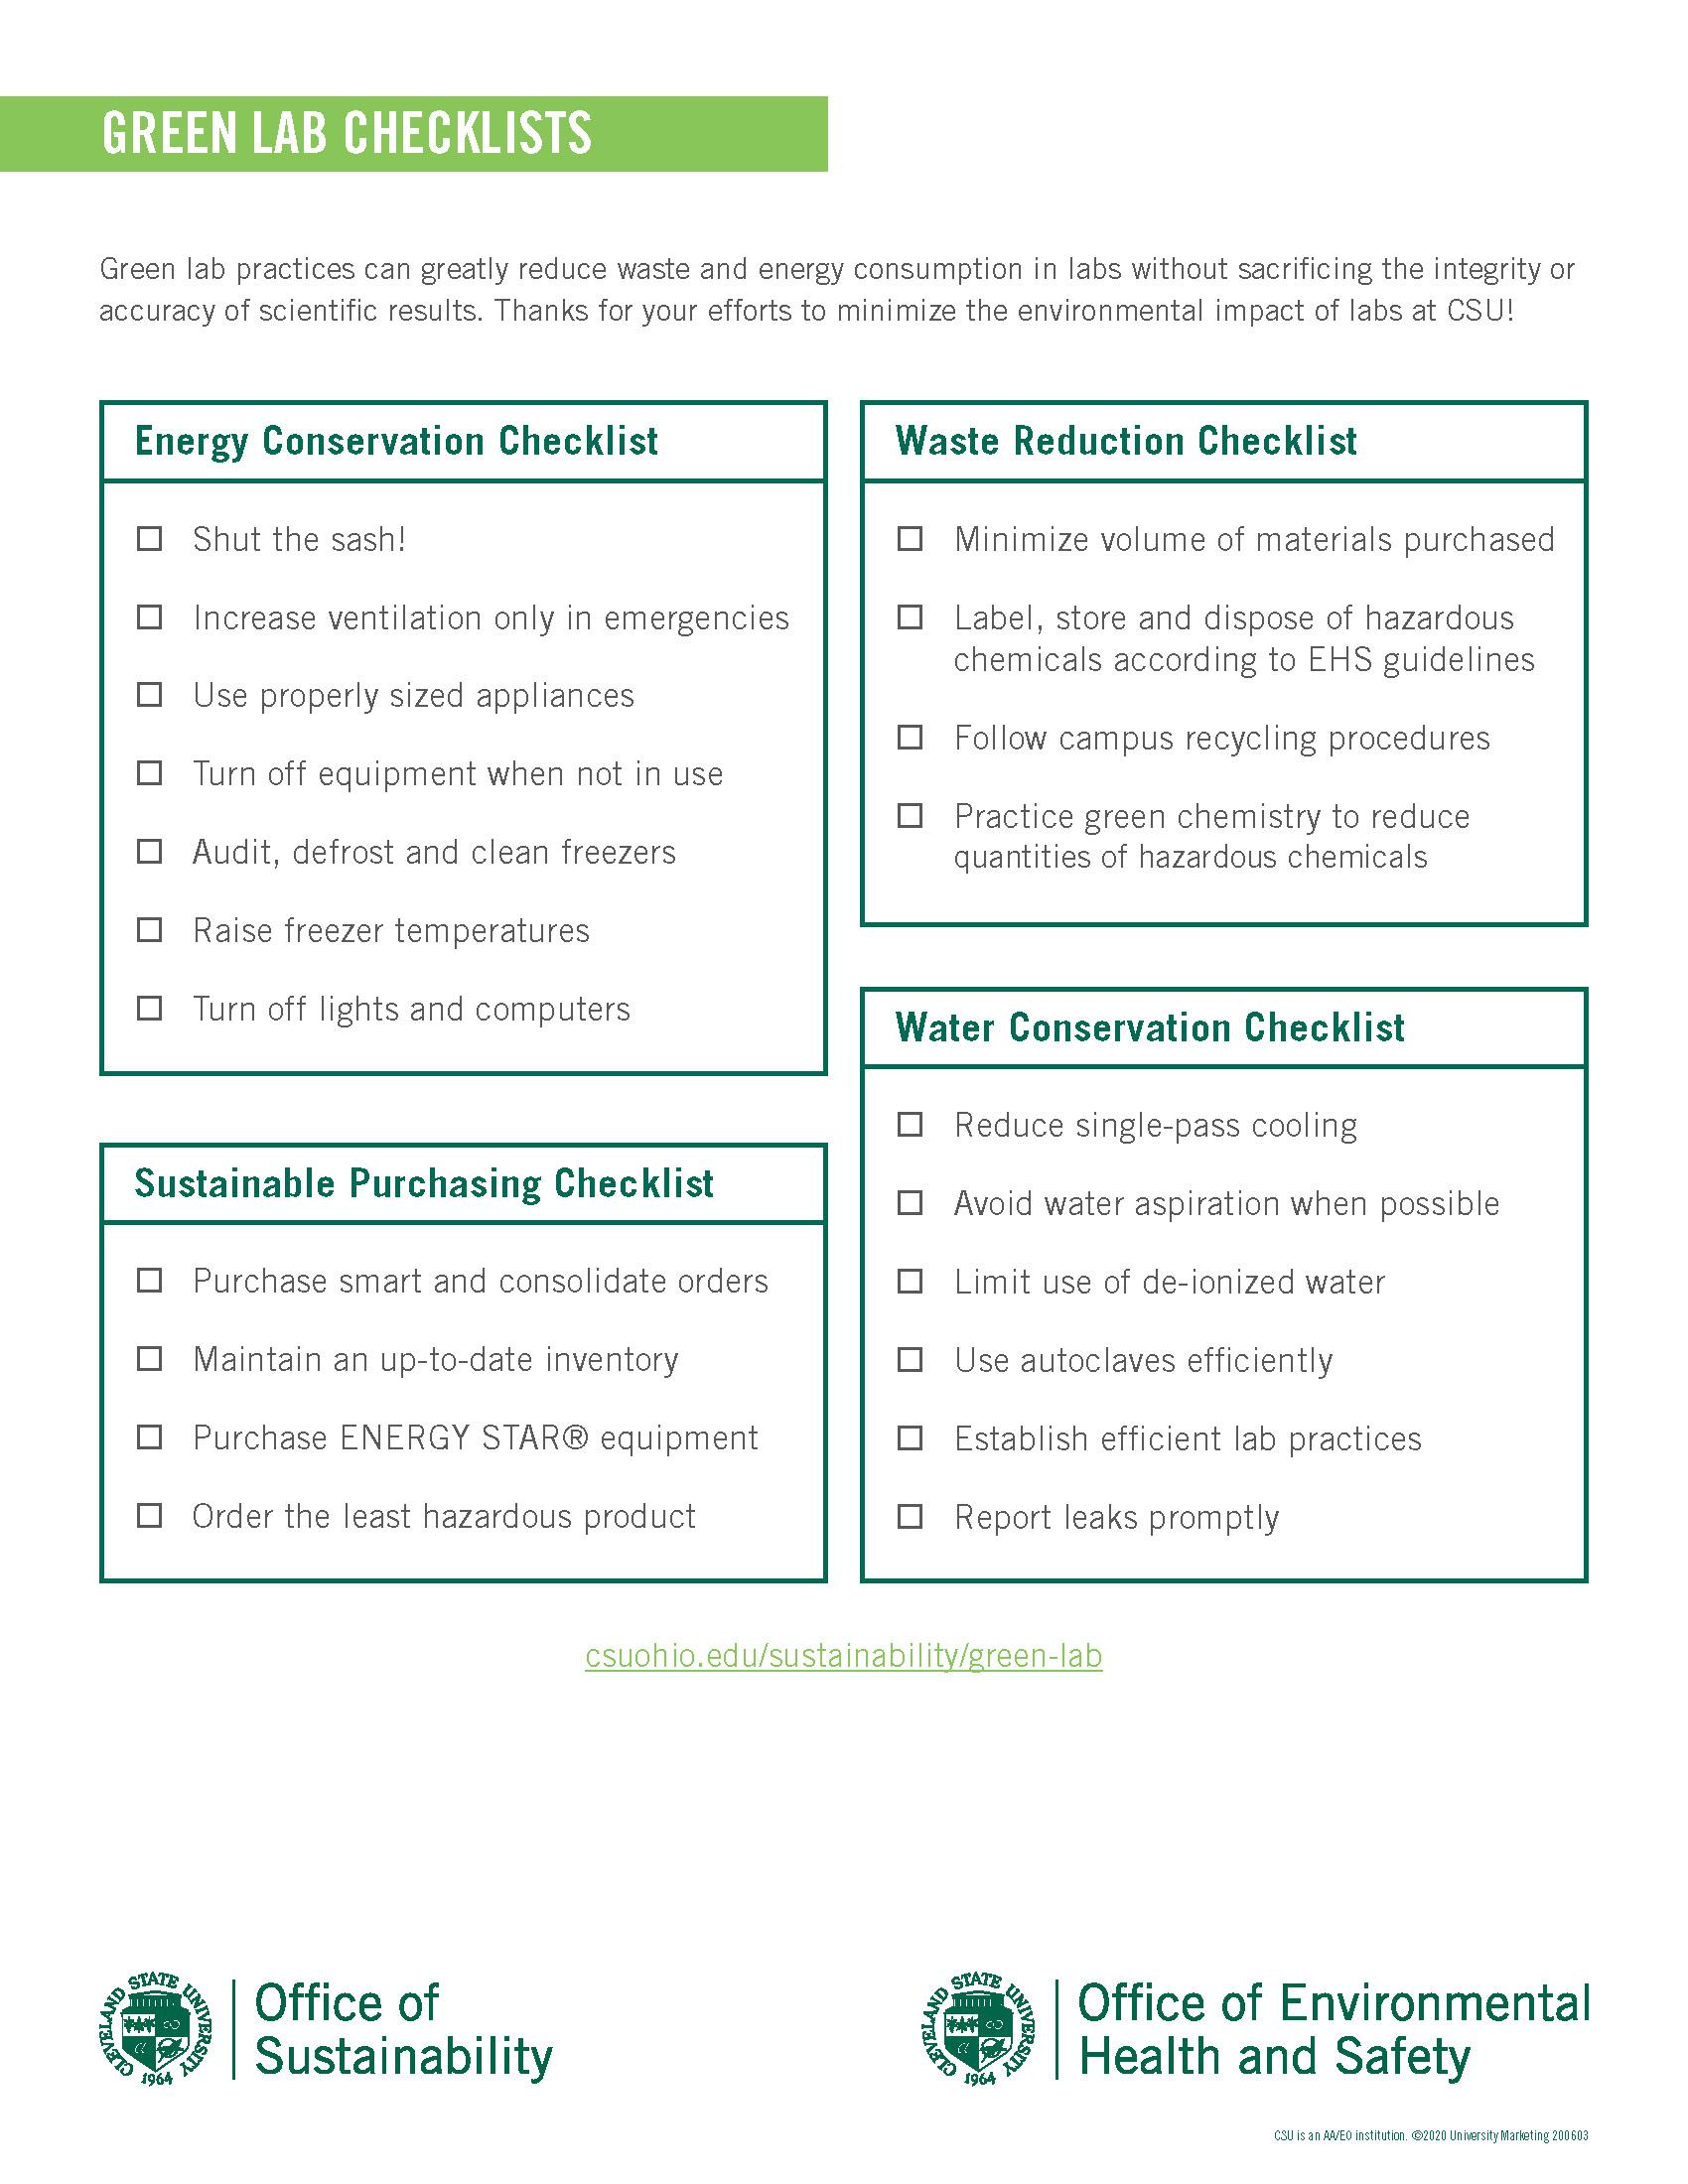 Green Lab Checklist